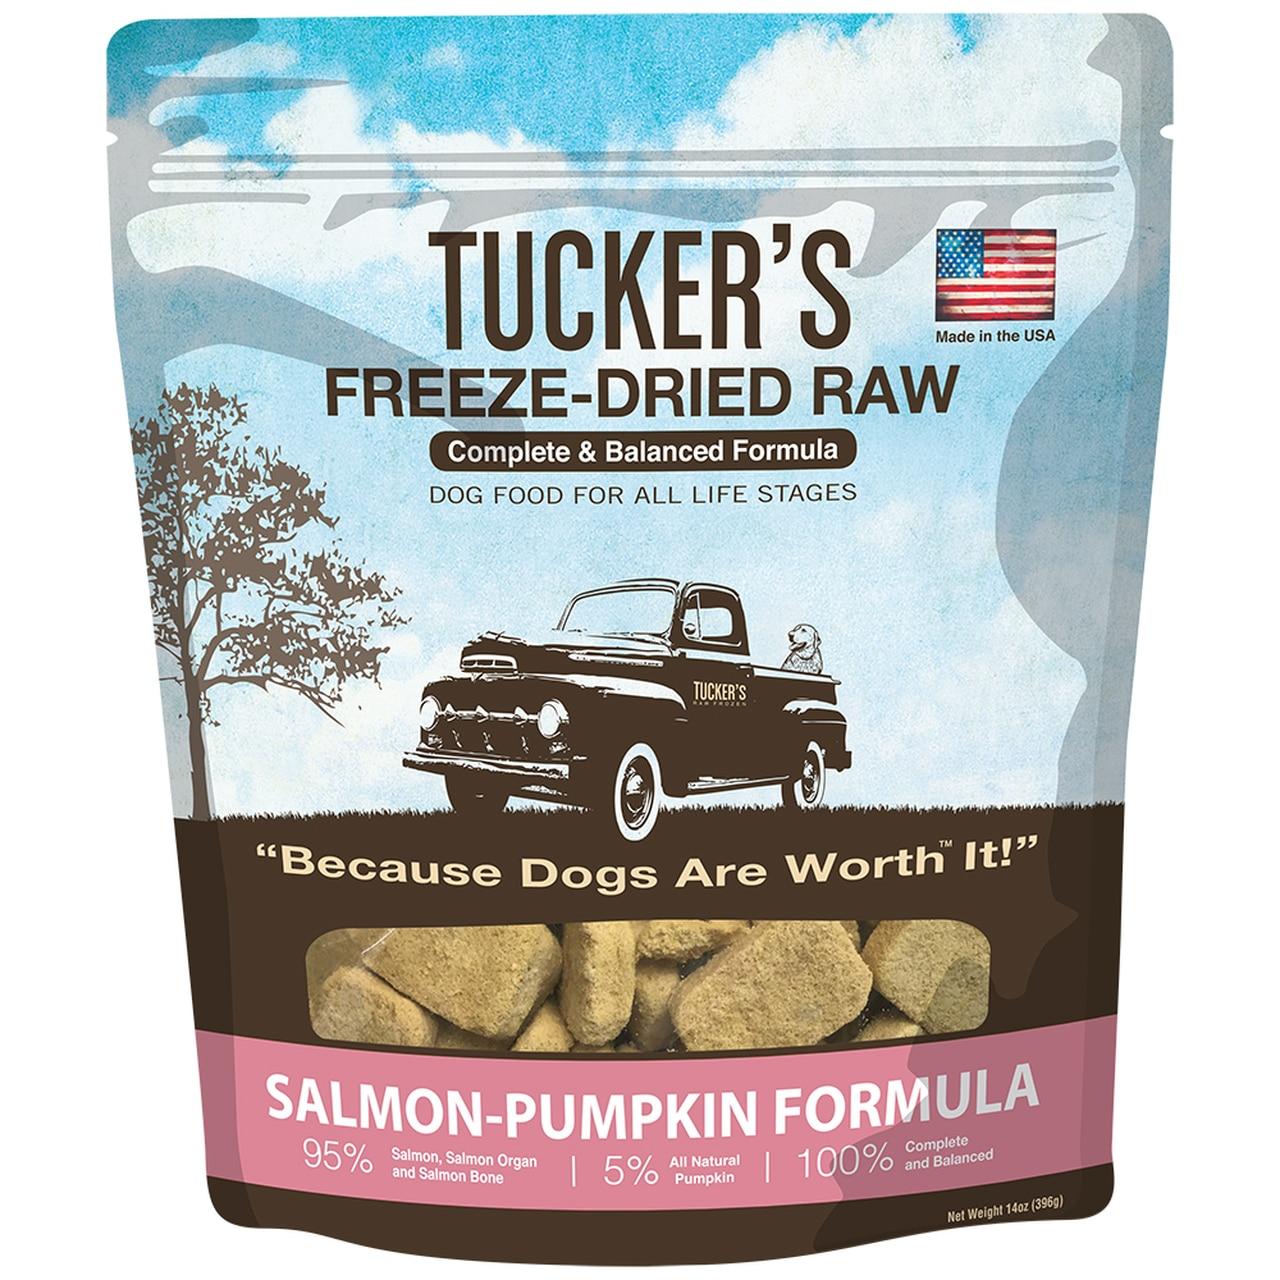 Tucker's Salmon-Pumpkin Formula Freeze-Dried Raw Dog Food, 12-oz